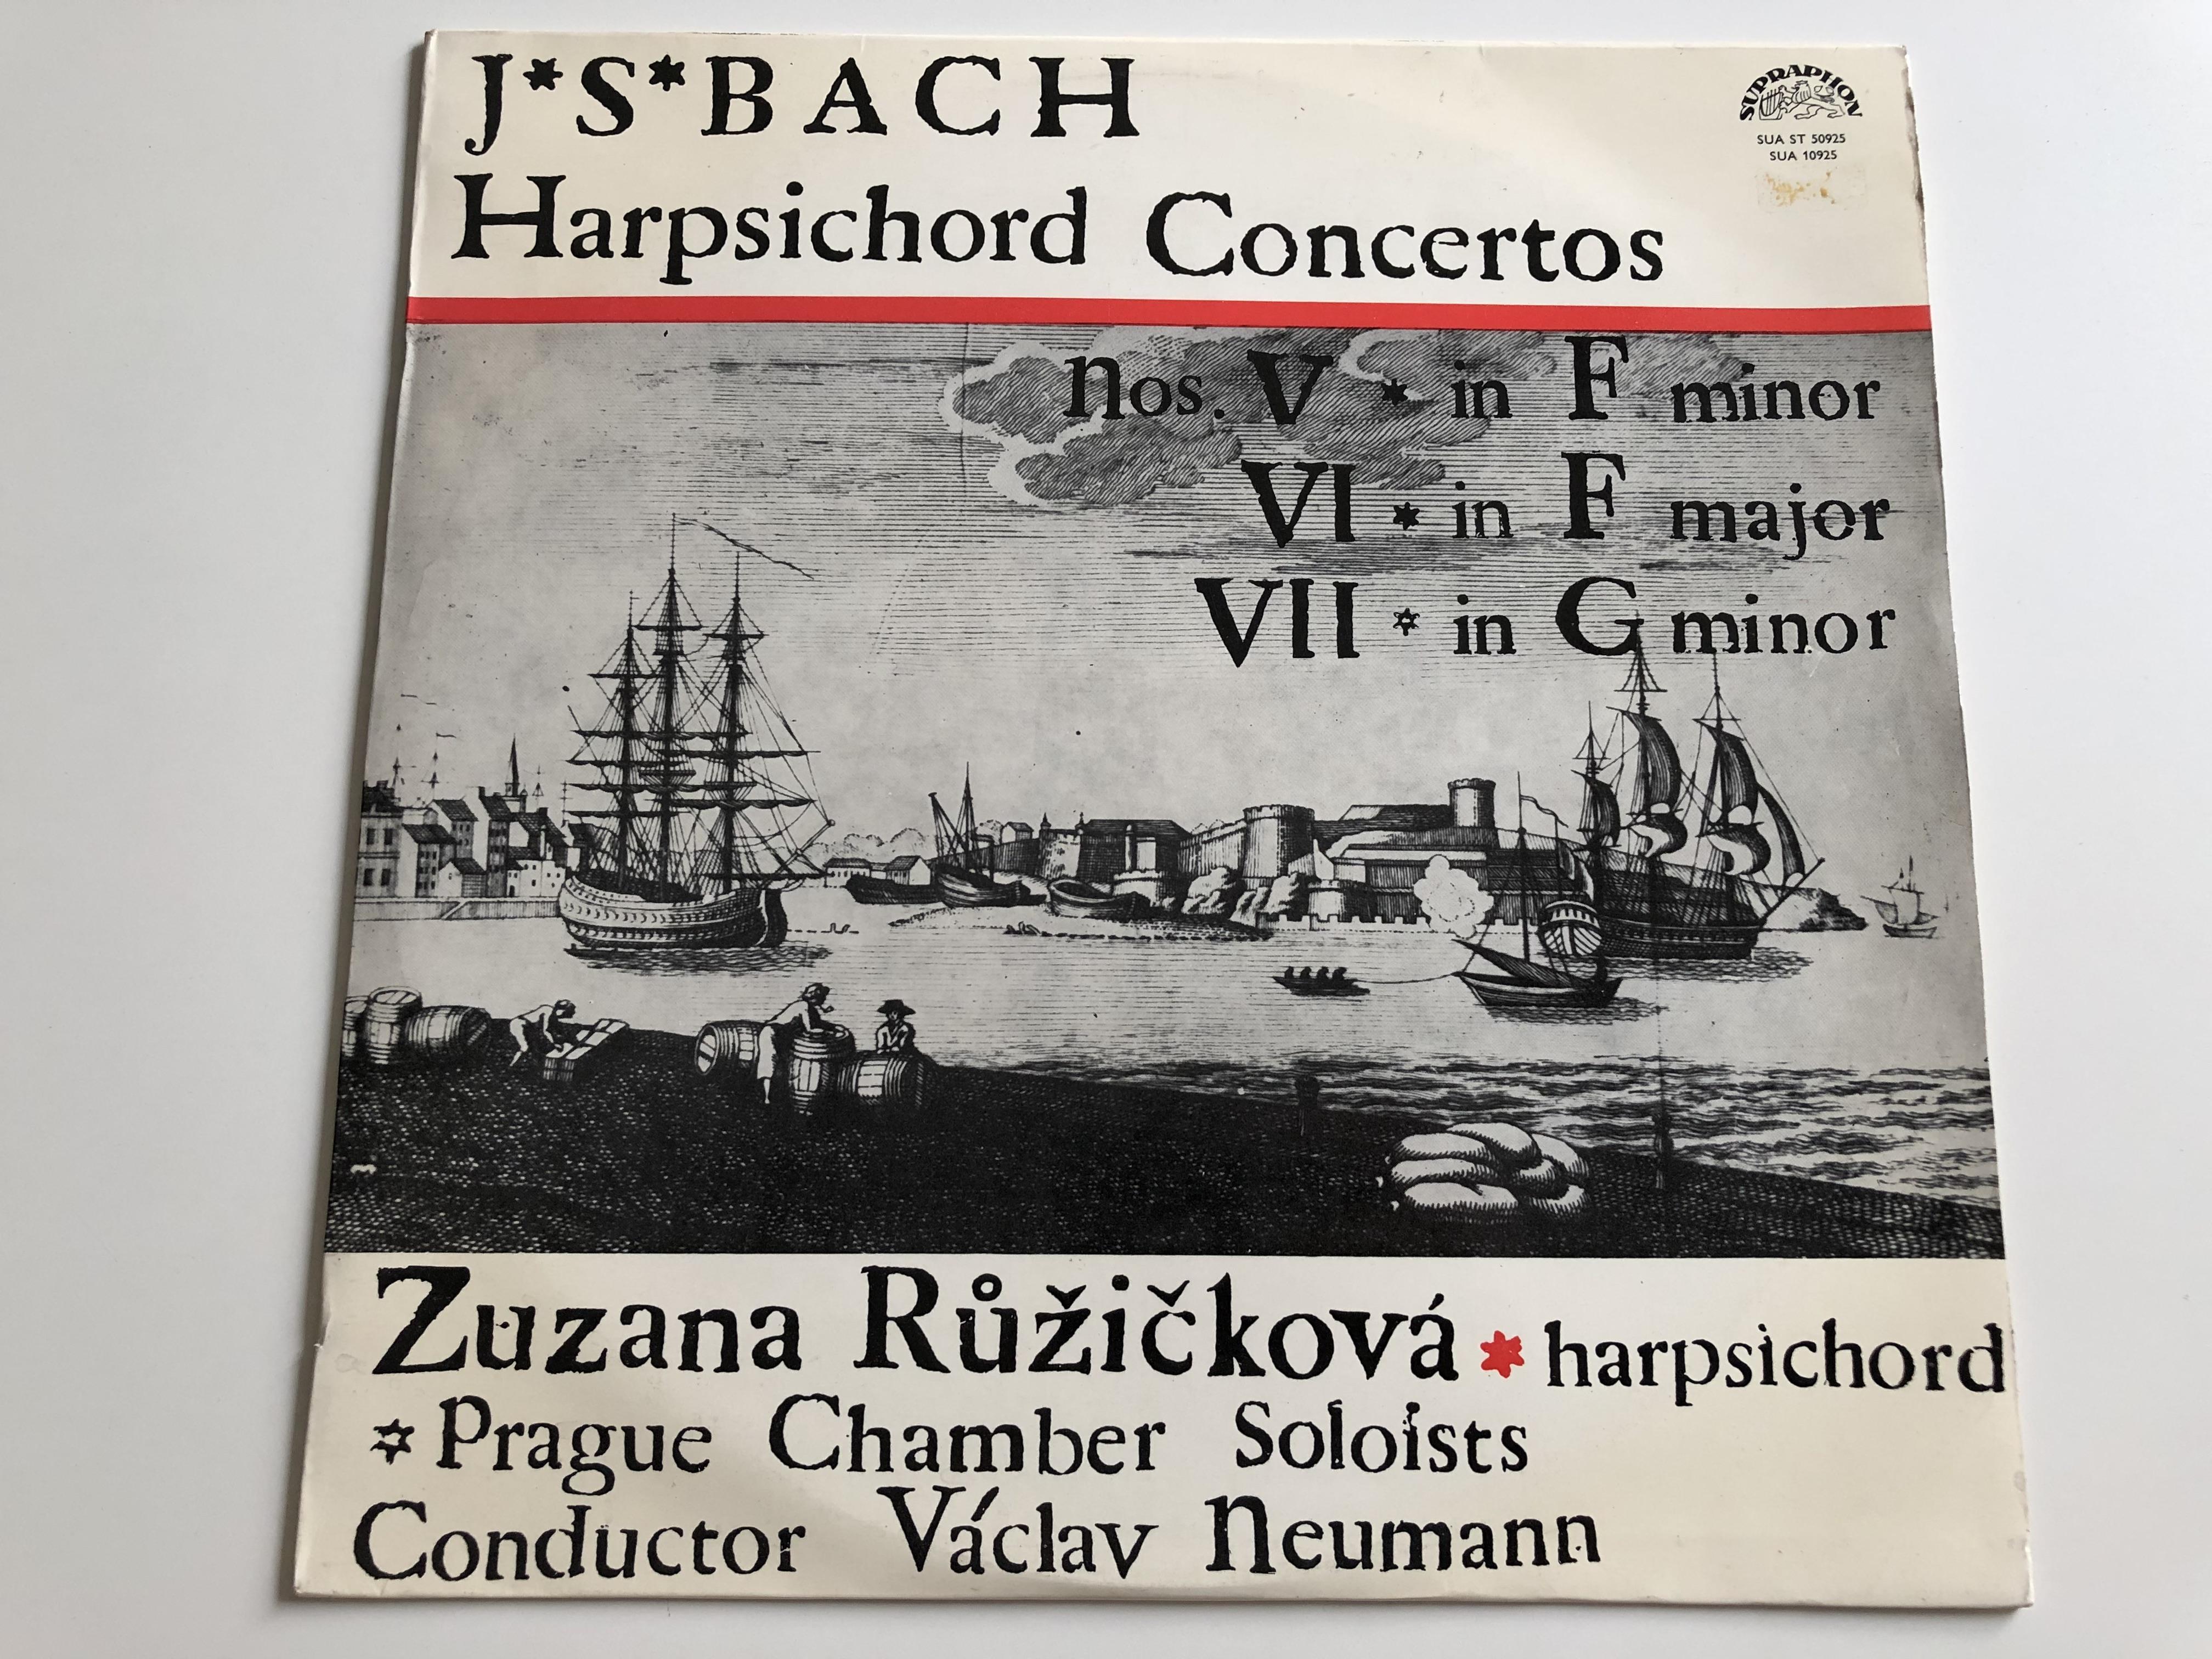 j.-s.-bach-harpsichord-concertos-nos.-v-in-f-minor-vi-in-f-major-vii-in-g-minor-zuzana-r-i-kov-prague-chamber-soloists-conductor-v-clav-neumann-supraphon-lp-sua-10925-sua-st-5092-1-.jpg